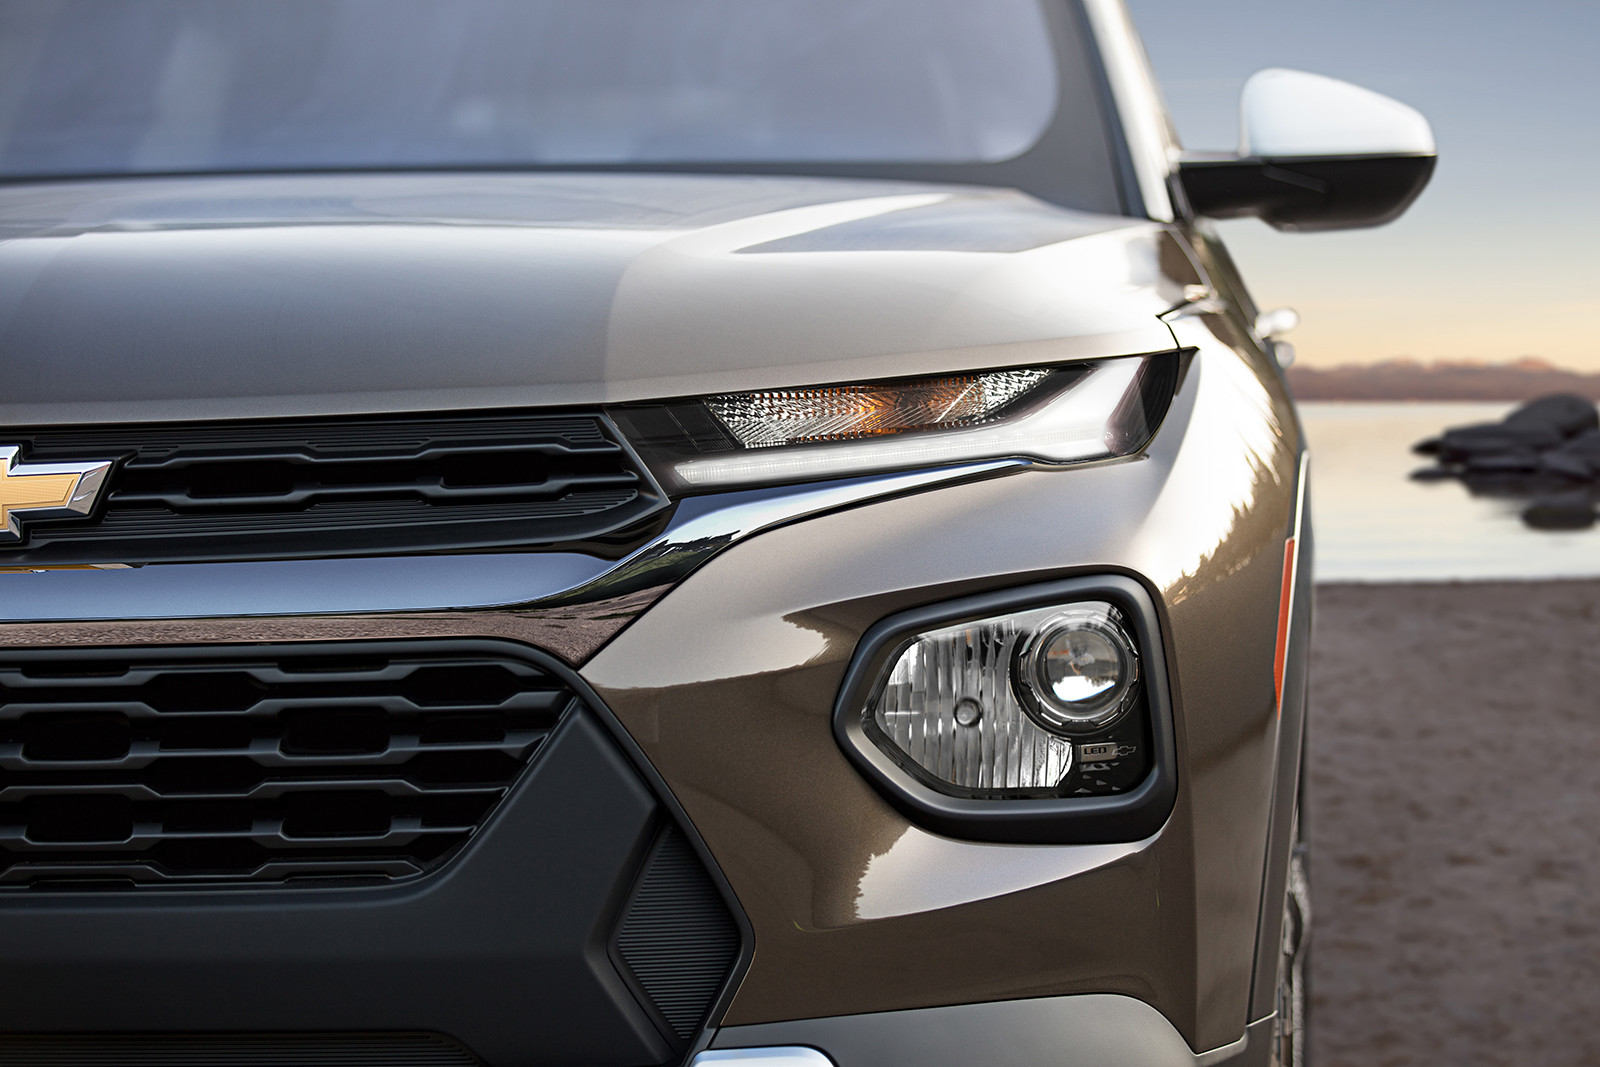 Foto de Chevrolet Trailblazer 2021 (6/26)